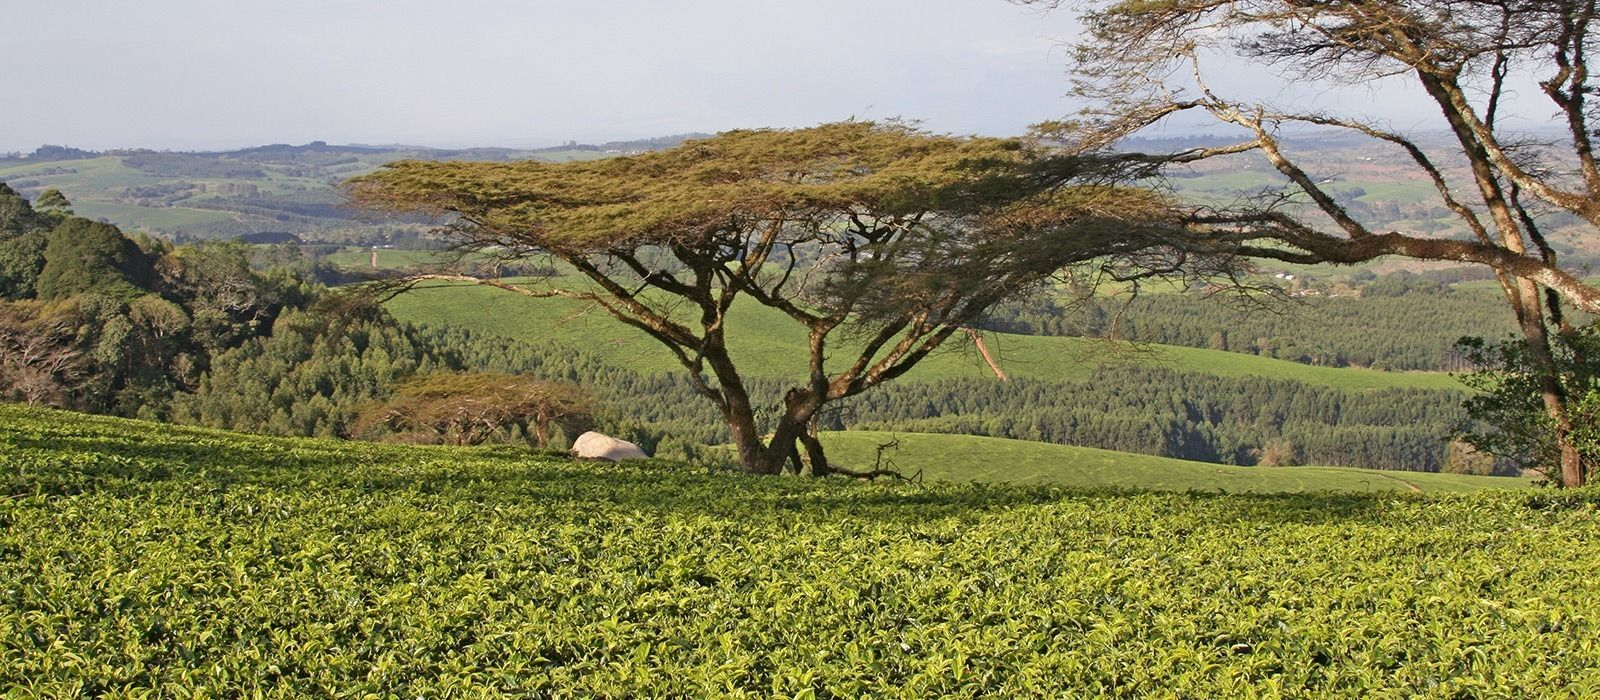 Malawi Rundreise: Natur, Safari und Lake Malawi Urlaub 2